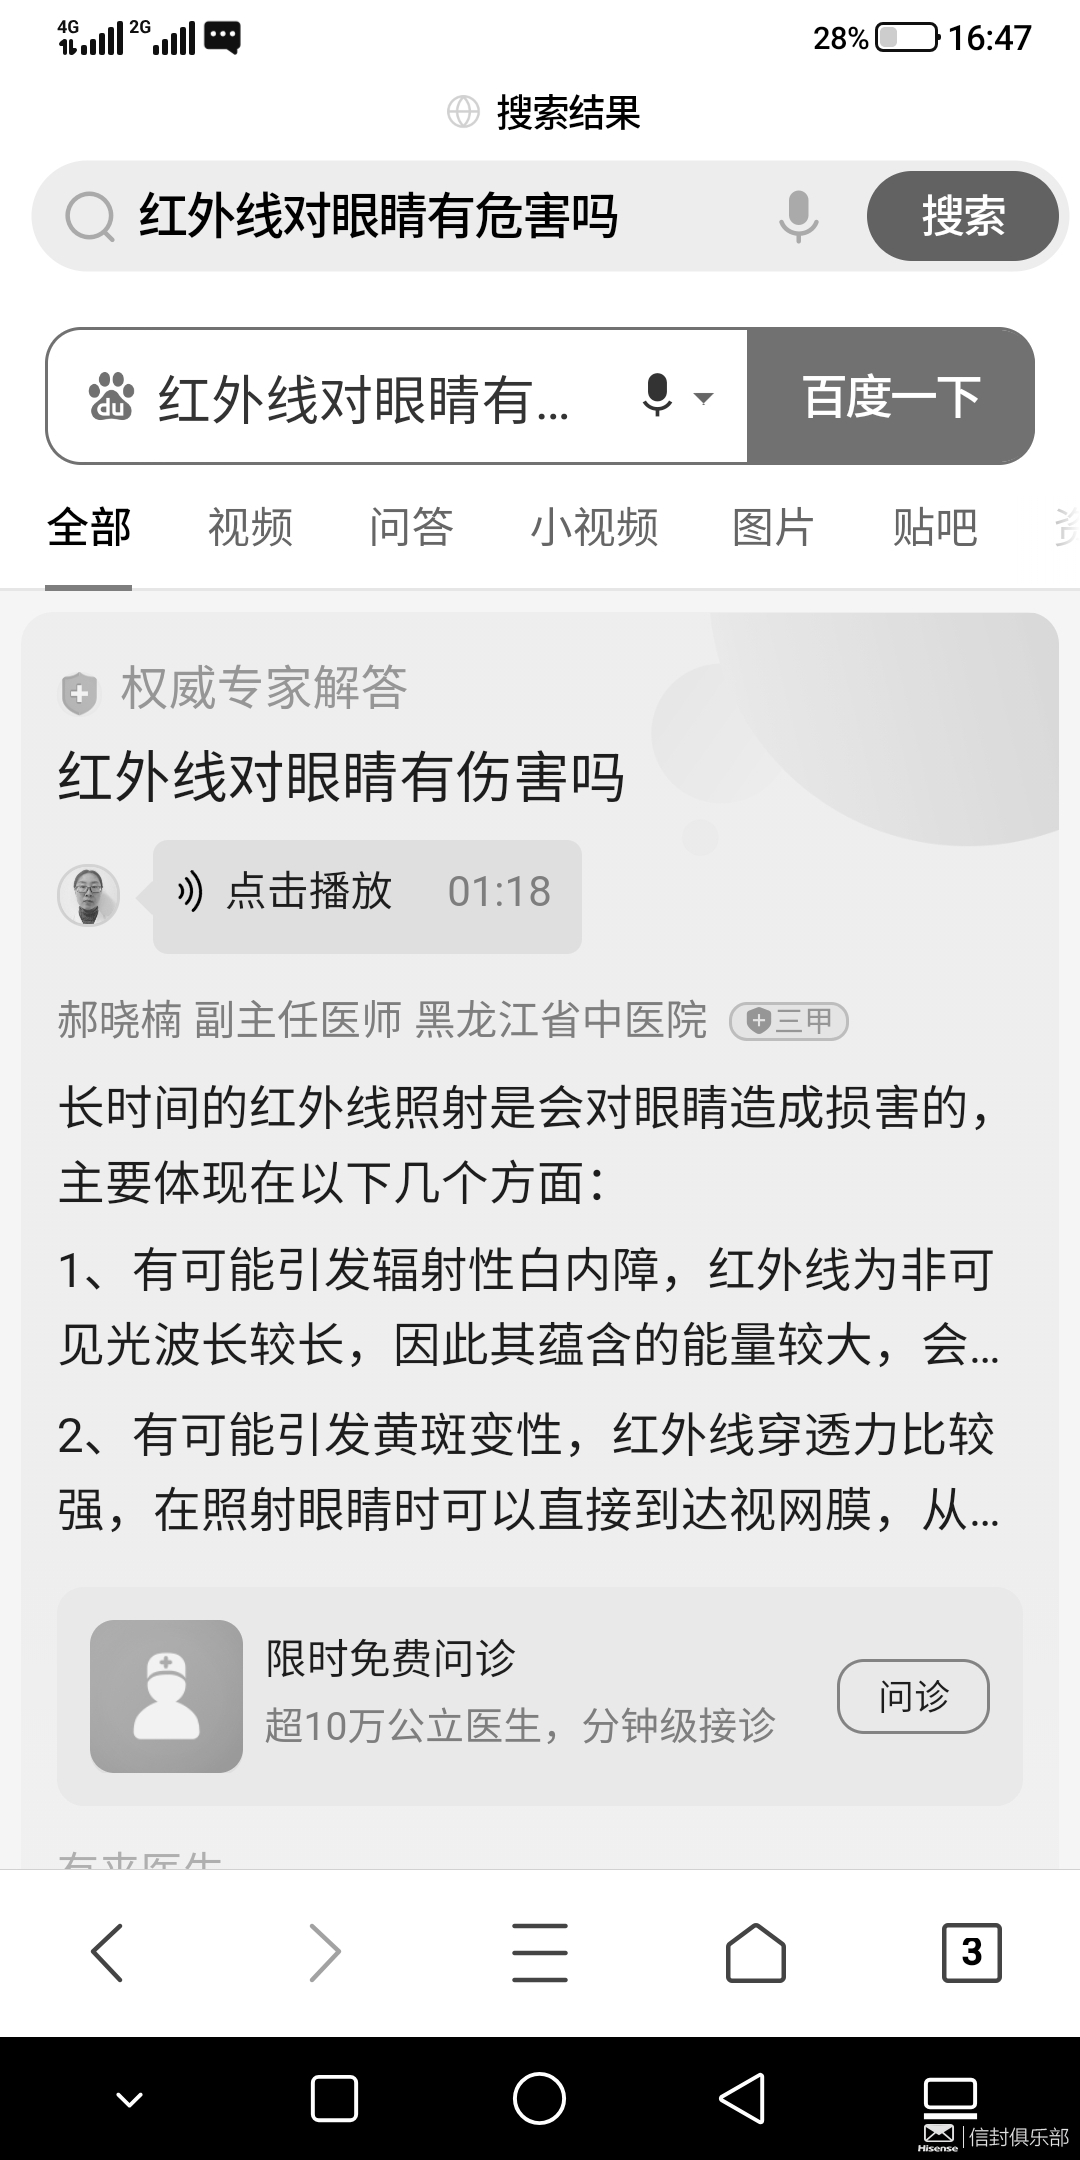 Screenshot_20210509_164707315_QQ浏览器.jpg